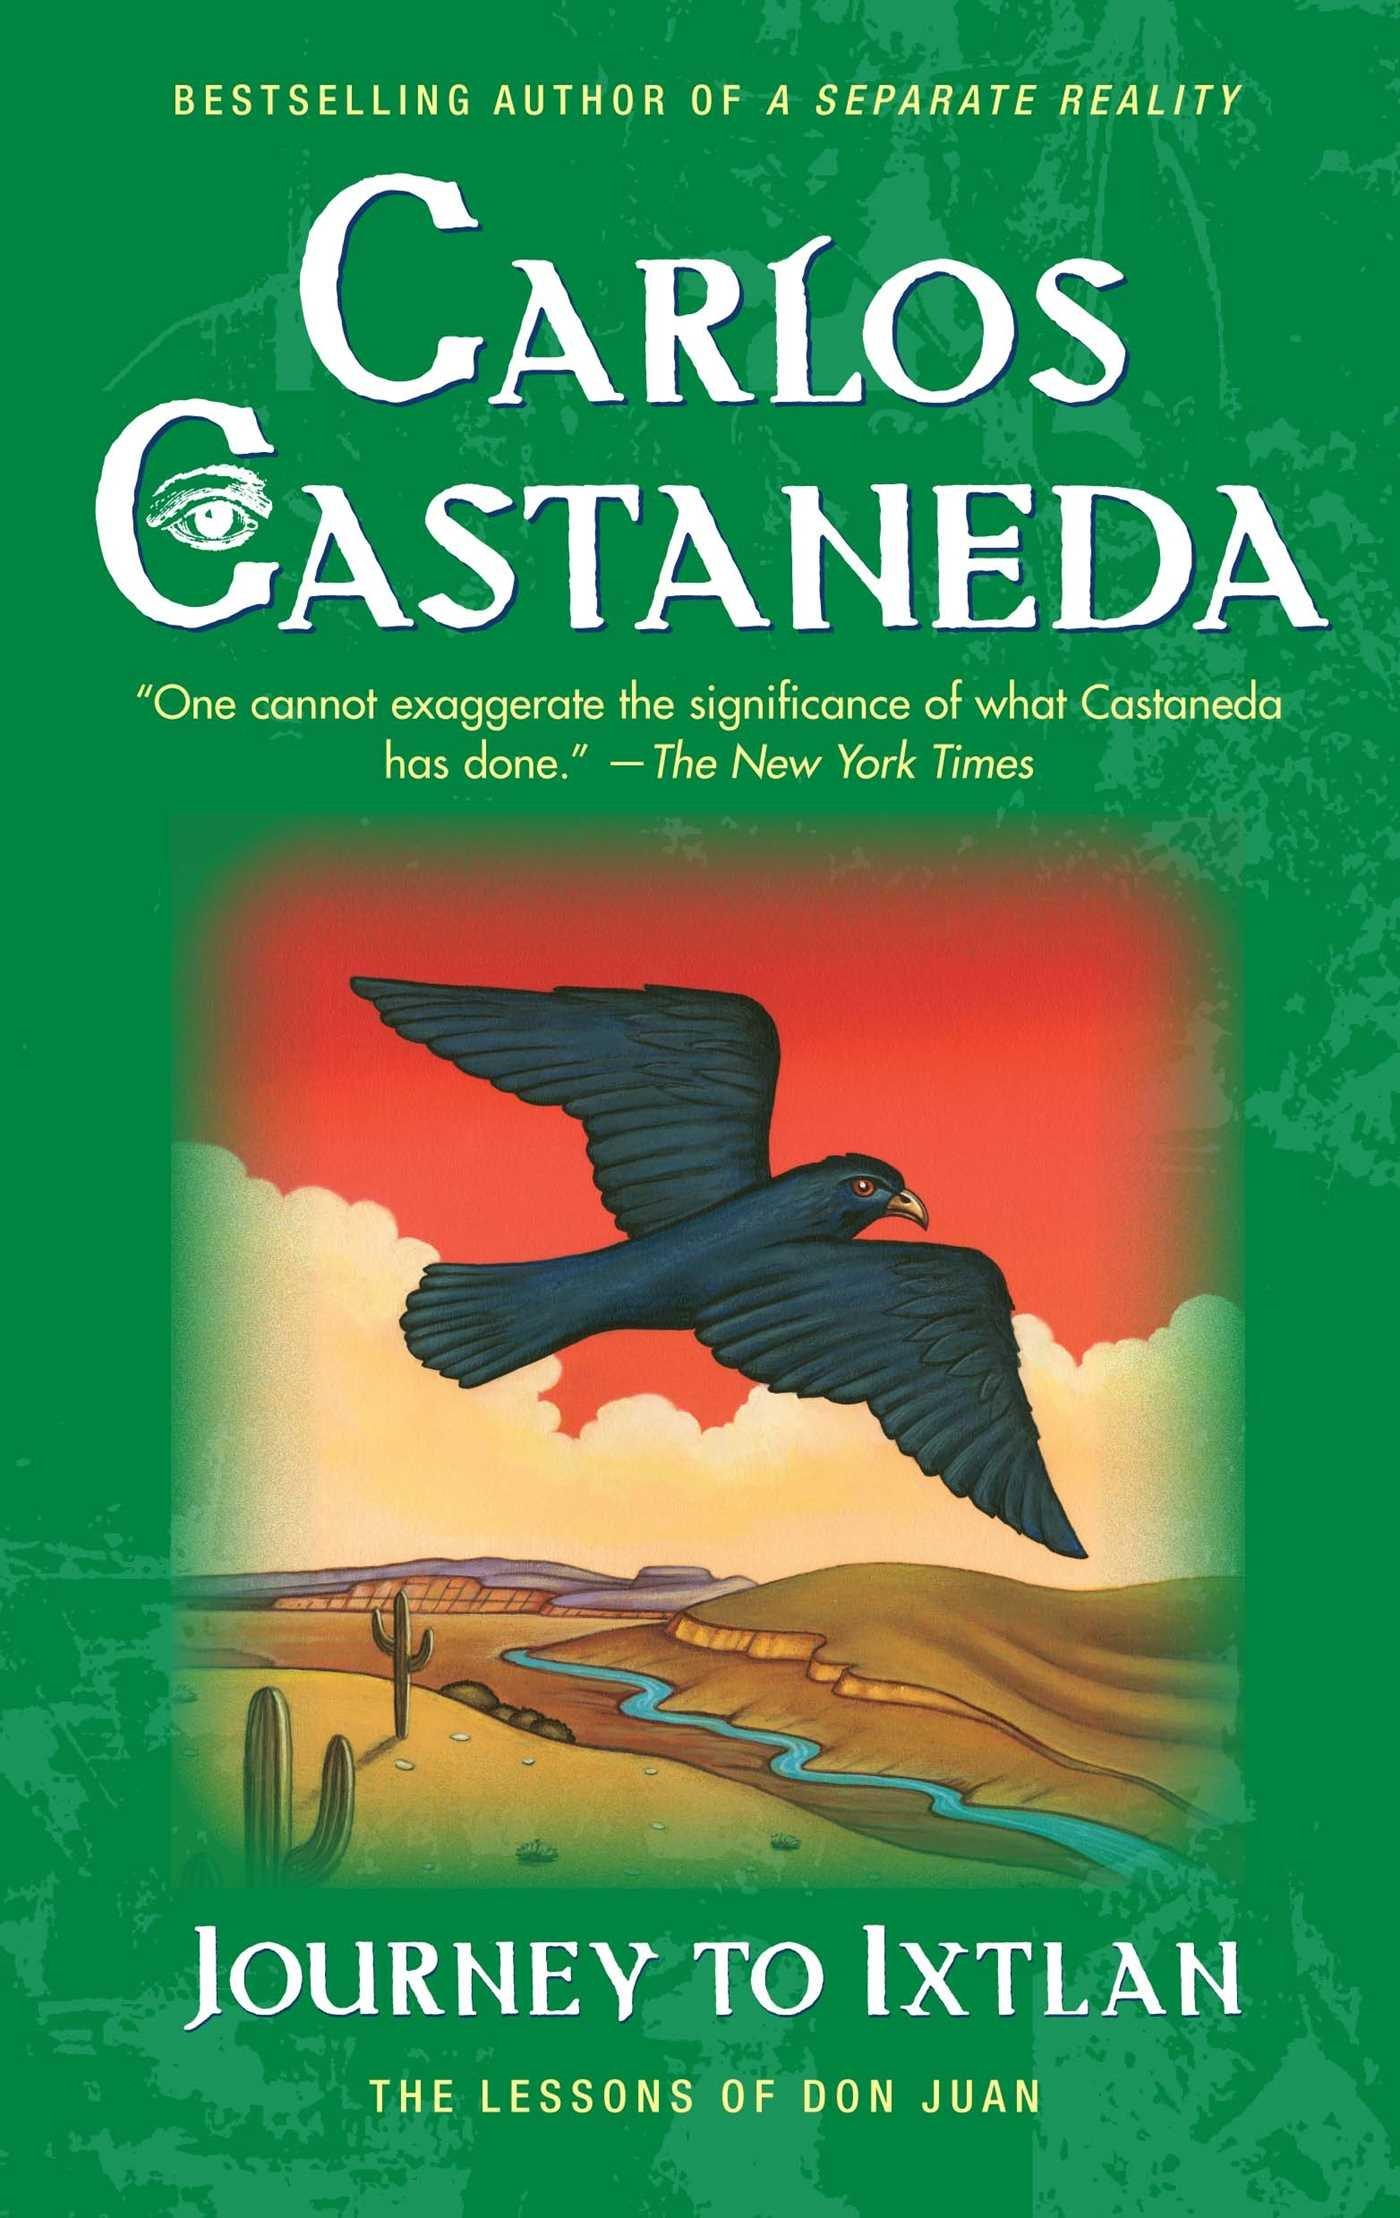 Book by Carlos Castaneda